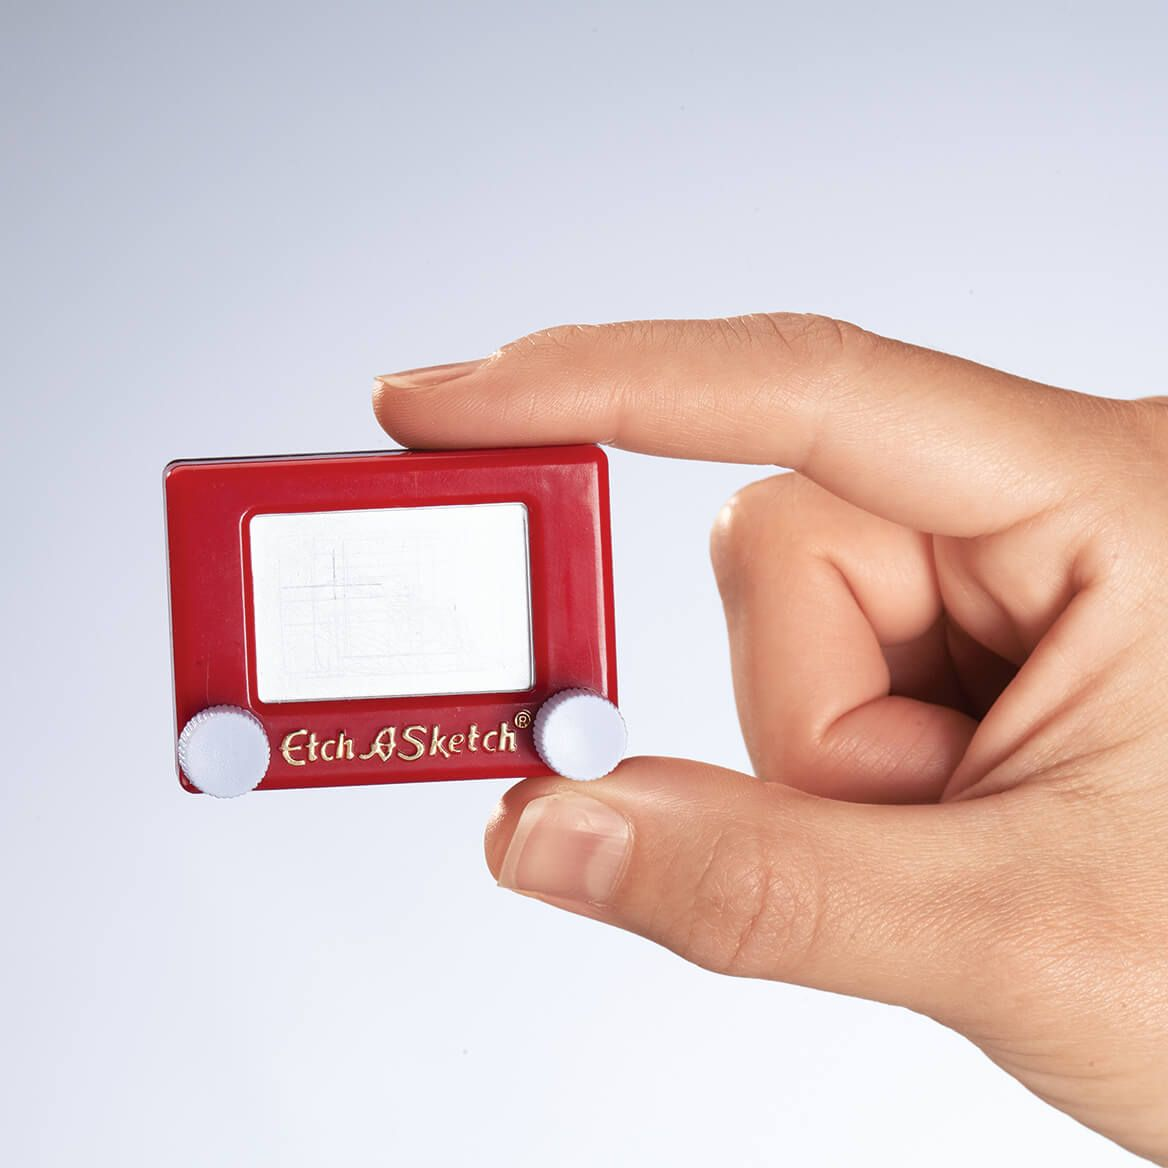 World's Smallest Etch A Sketch®-369180